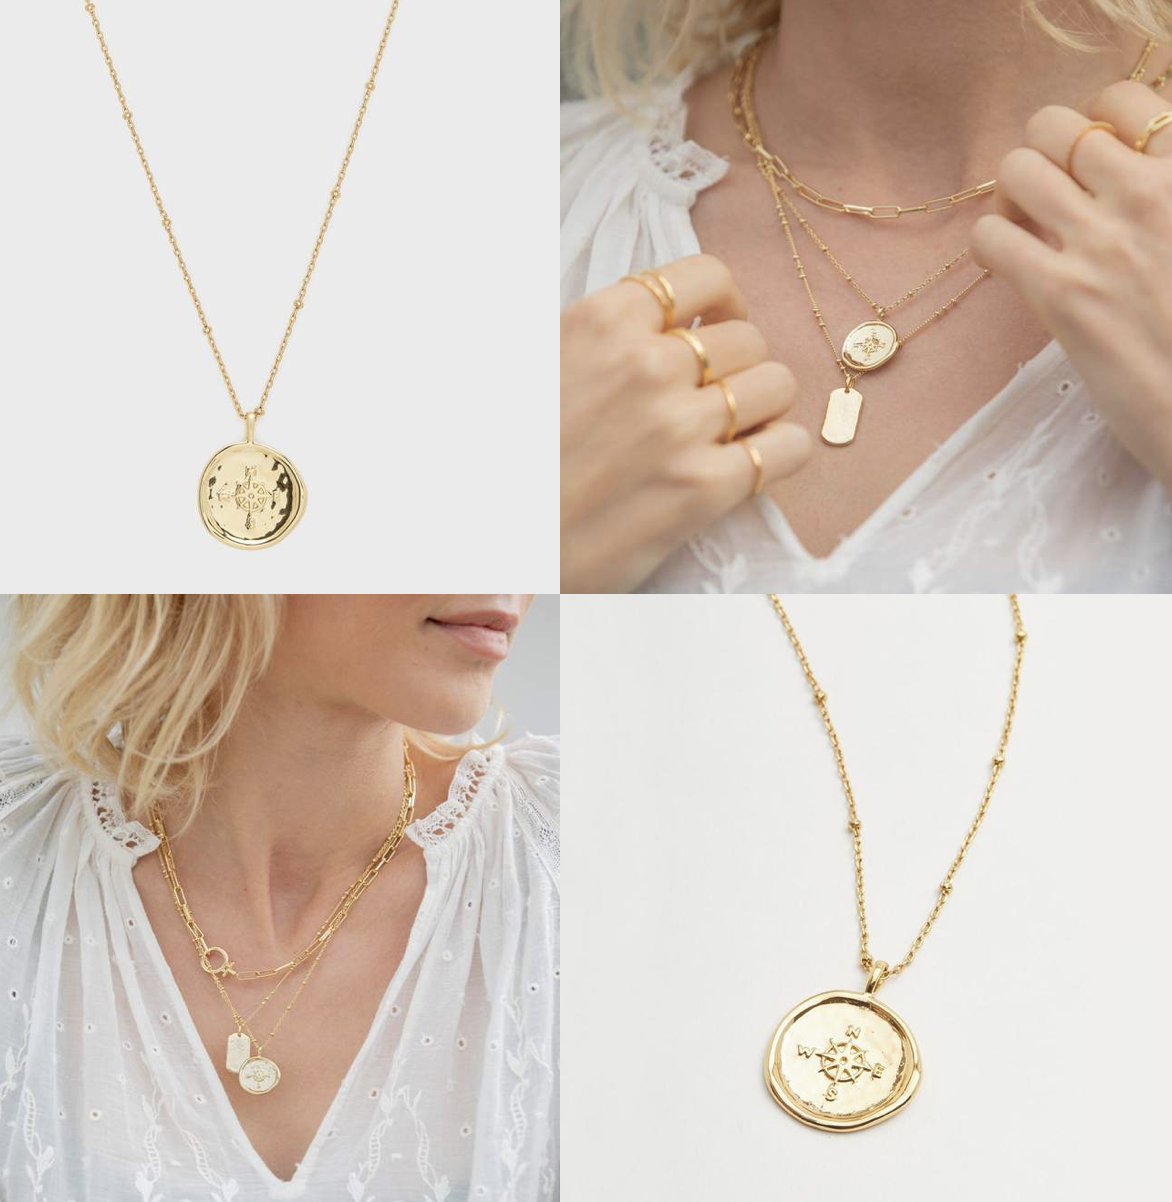 Compass Coin Necklace